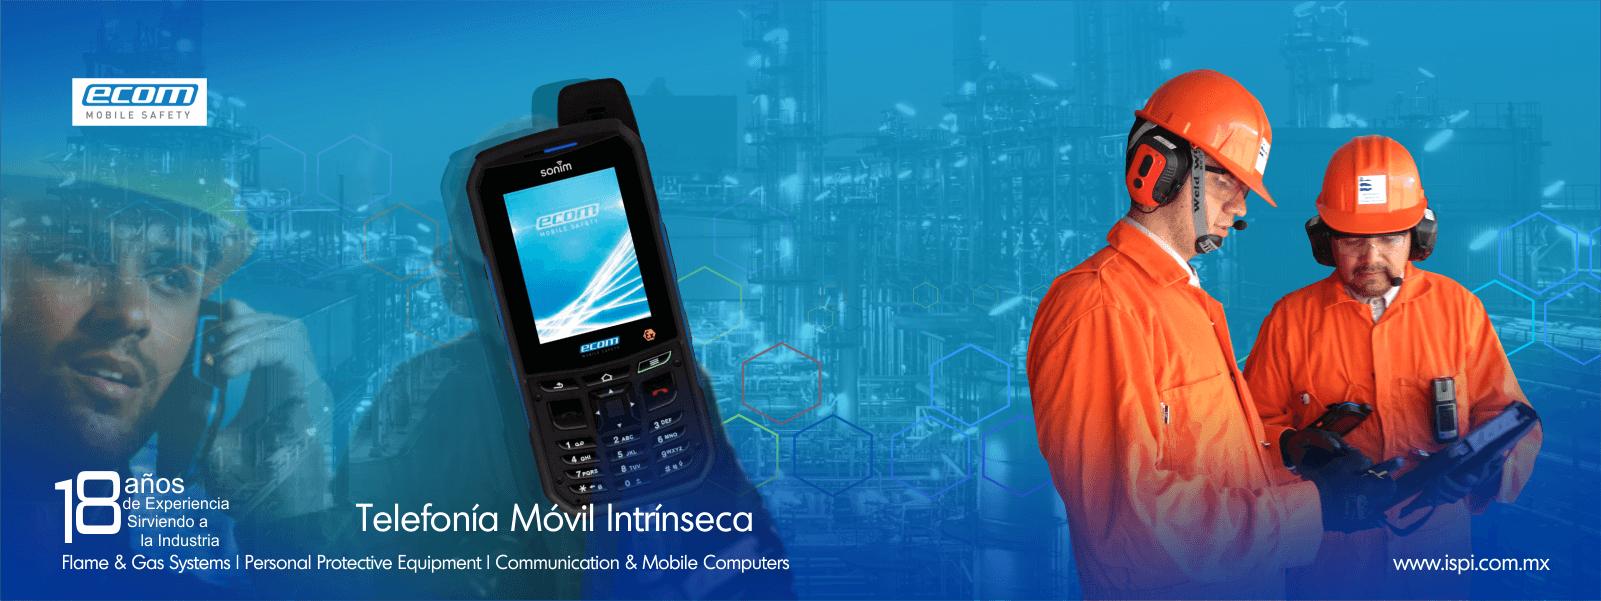 Ecom Telefonos Celulares Smart Ex-01 y Sensear Orejeras Inteligentes